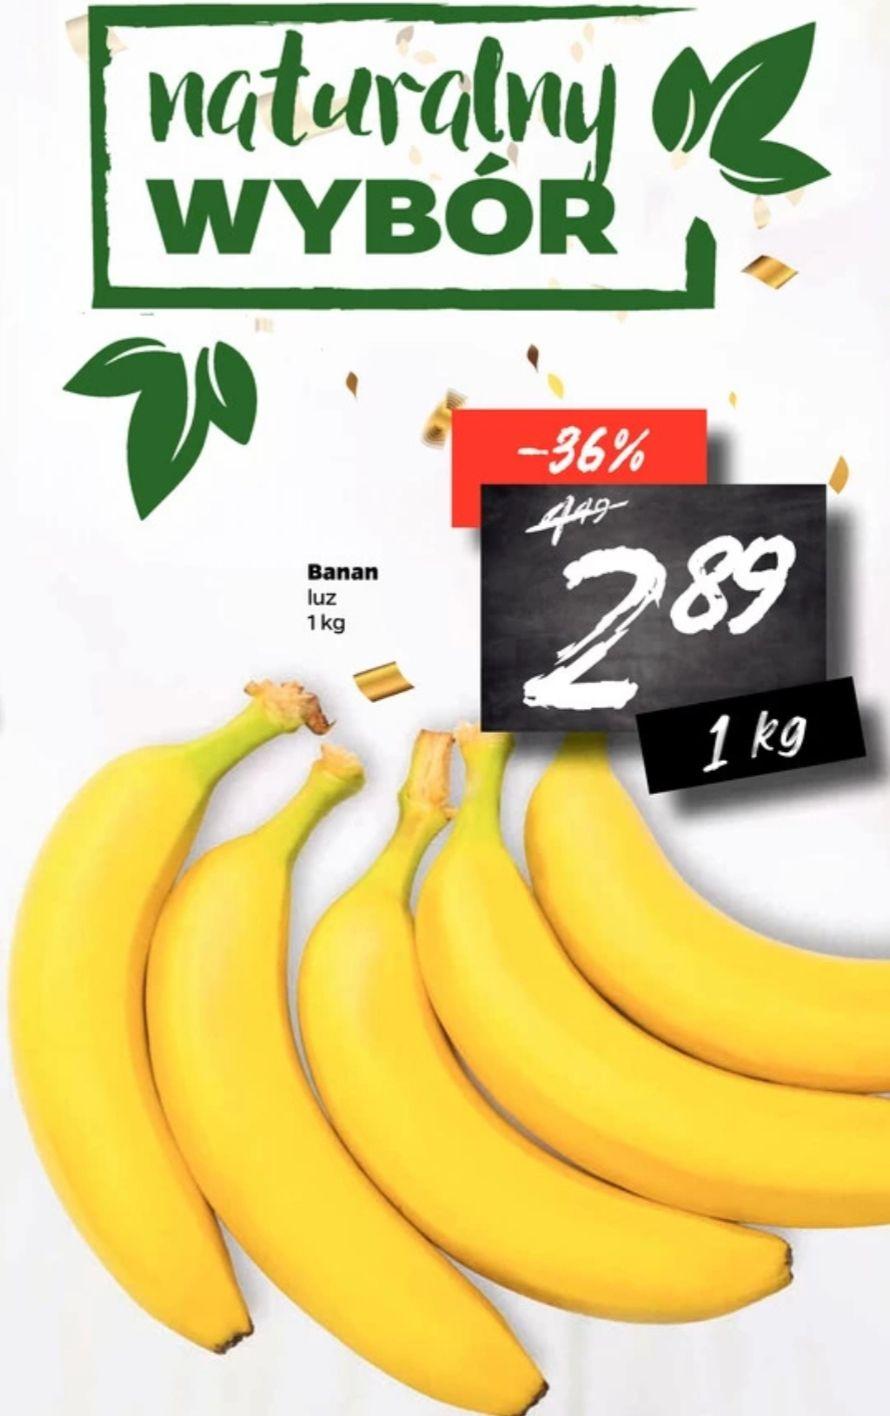 Banany 1kg/2.89 zł Netto od 16 do 21